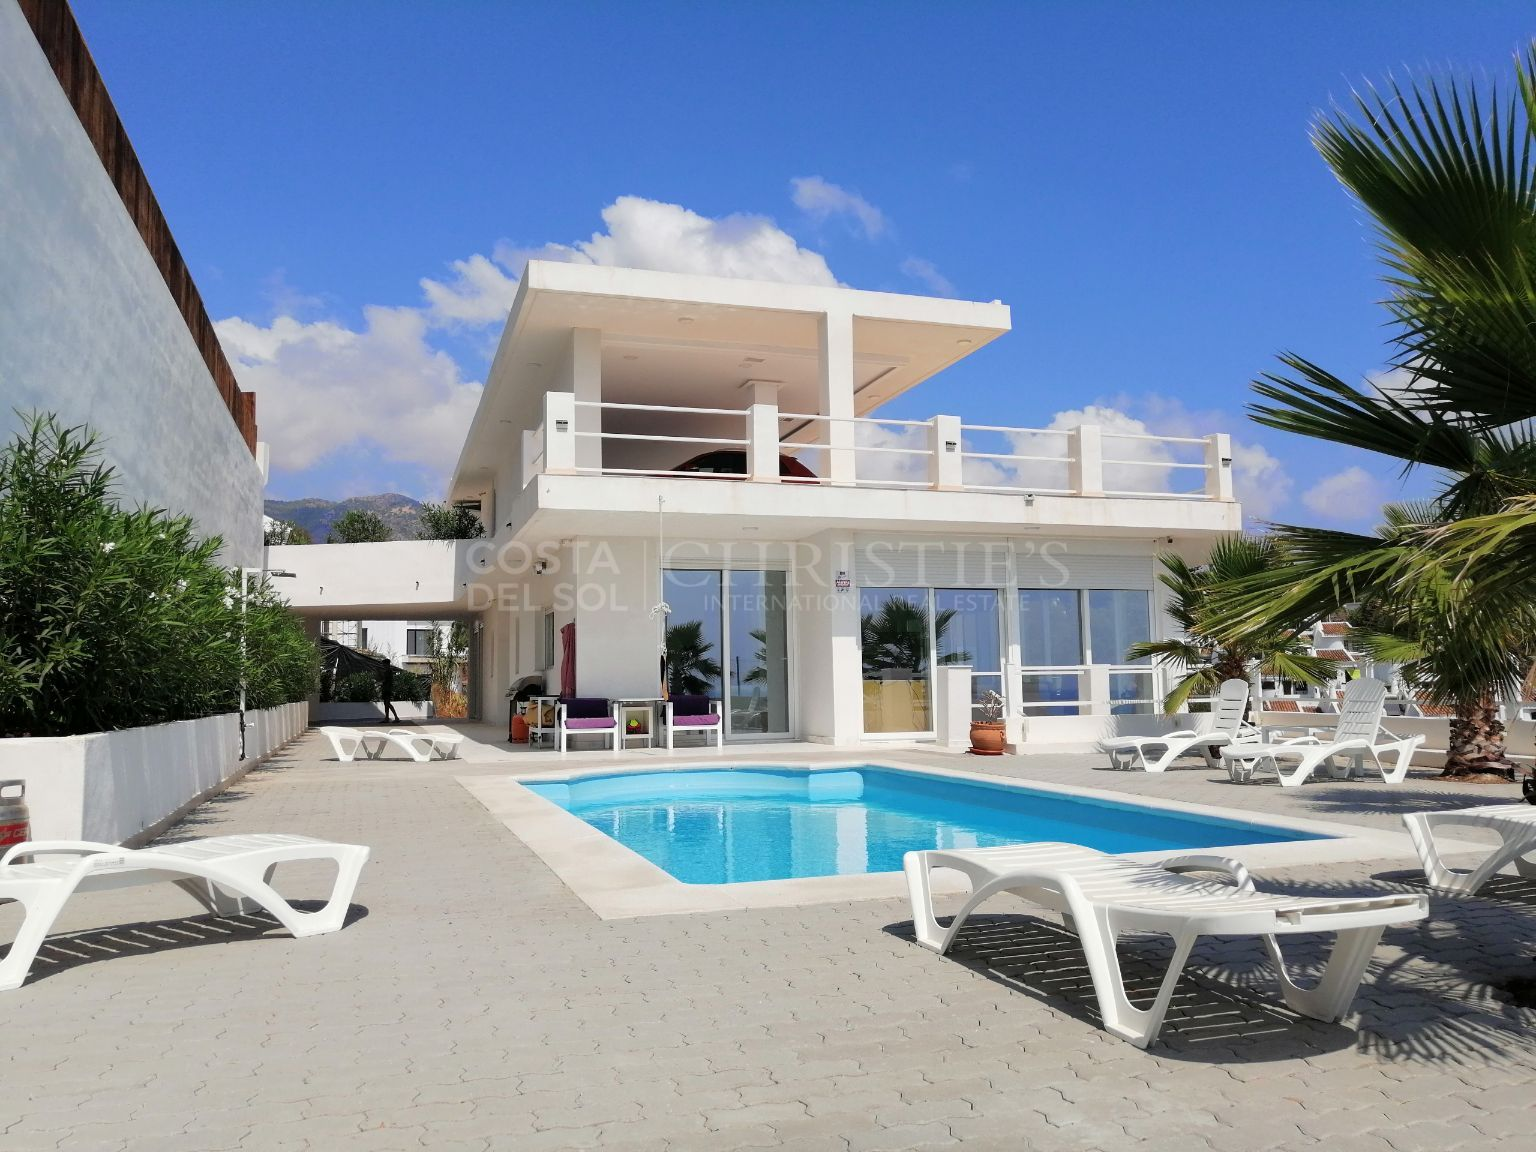 Stunning views of the Mediterranean in Benalmádena | Christie's International Real Estate